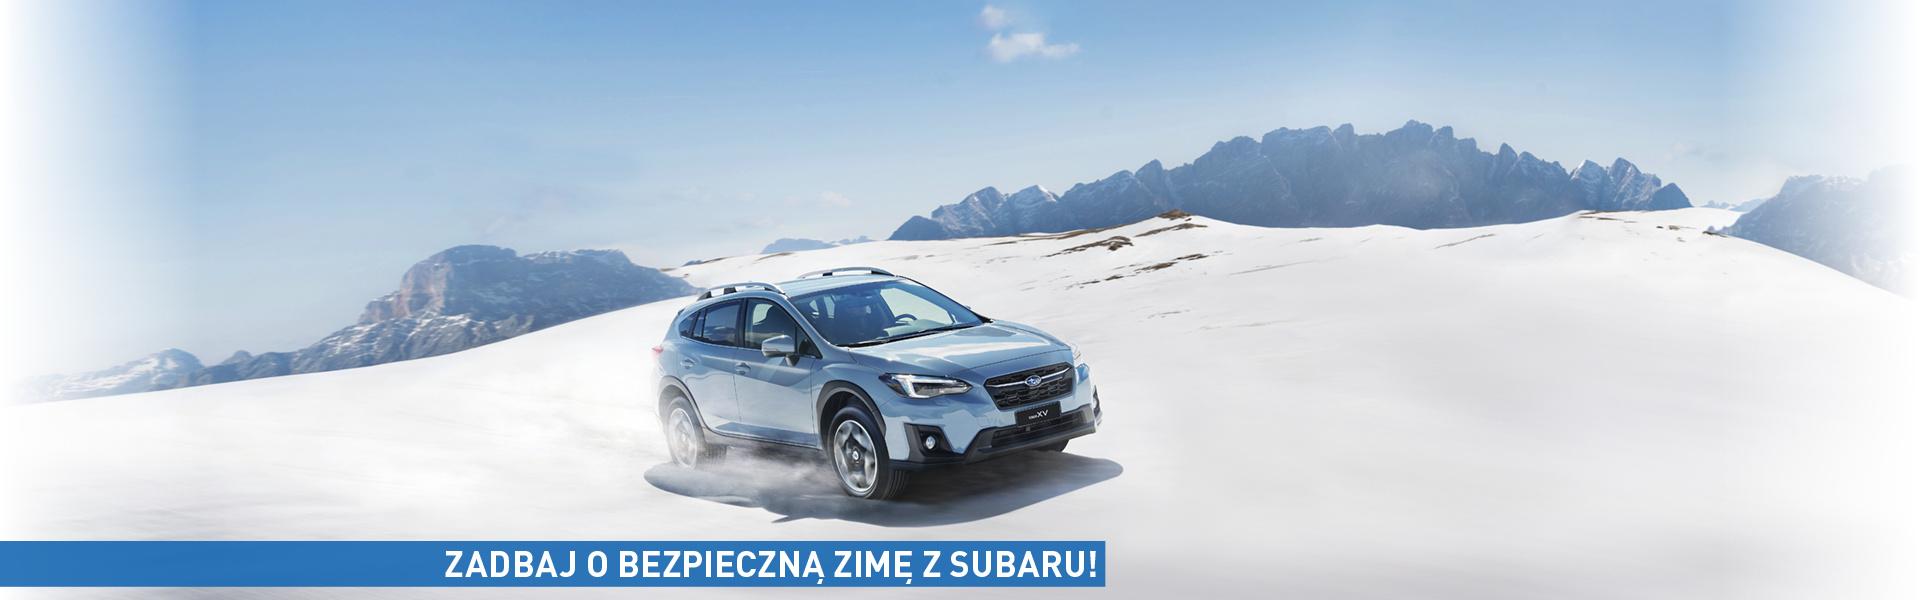 http://subaru.polmotor.pl/akcja-zima/